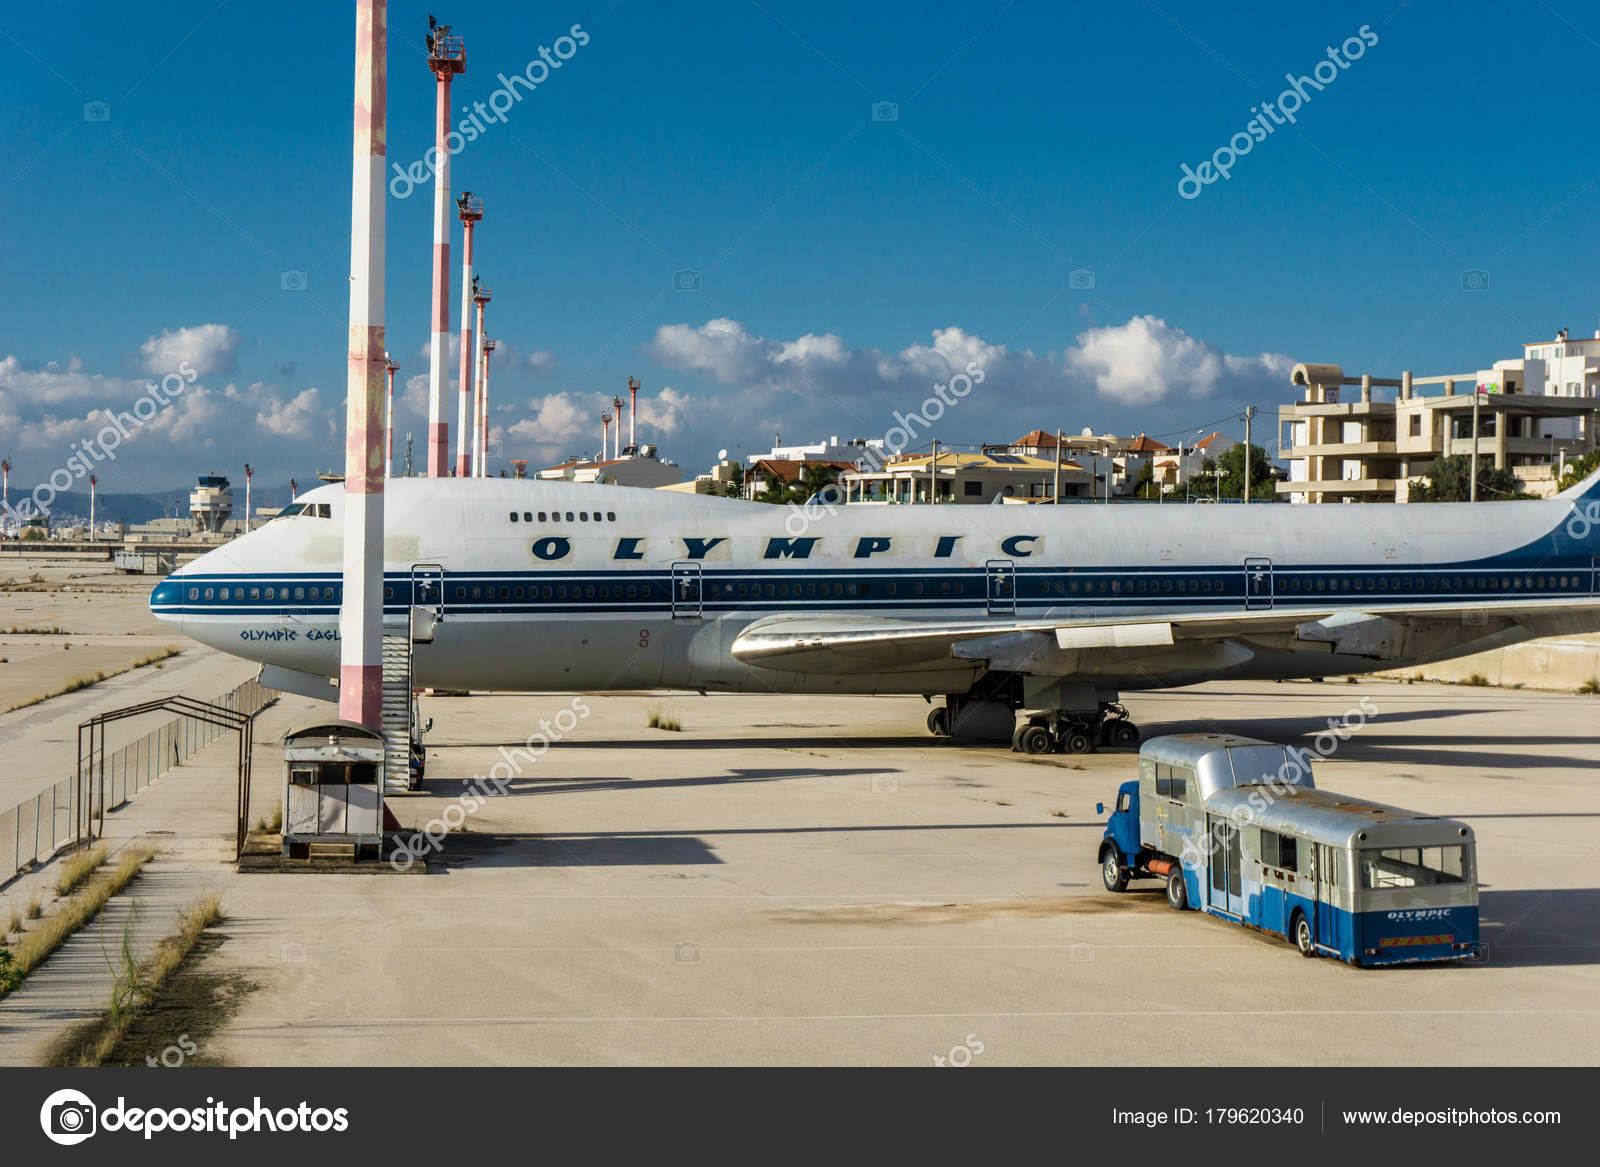 Aeroporto Atene : Aeroporto vecchio eliniko atene vista del piano